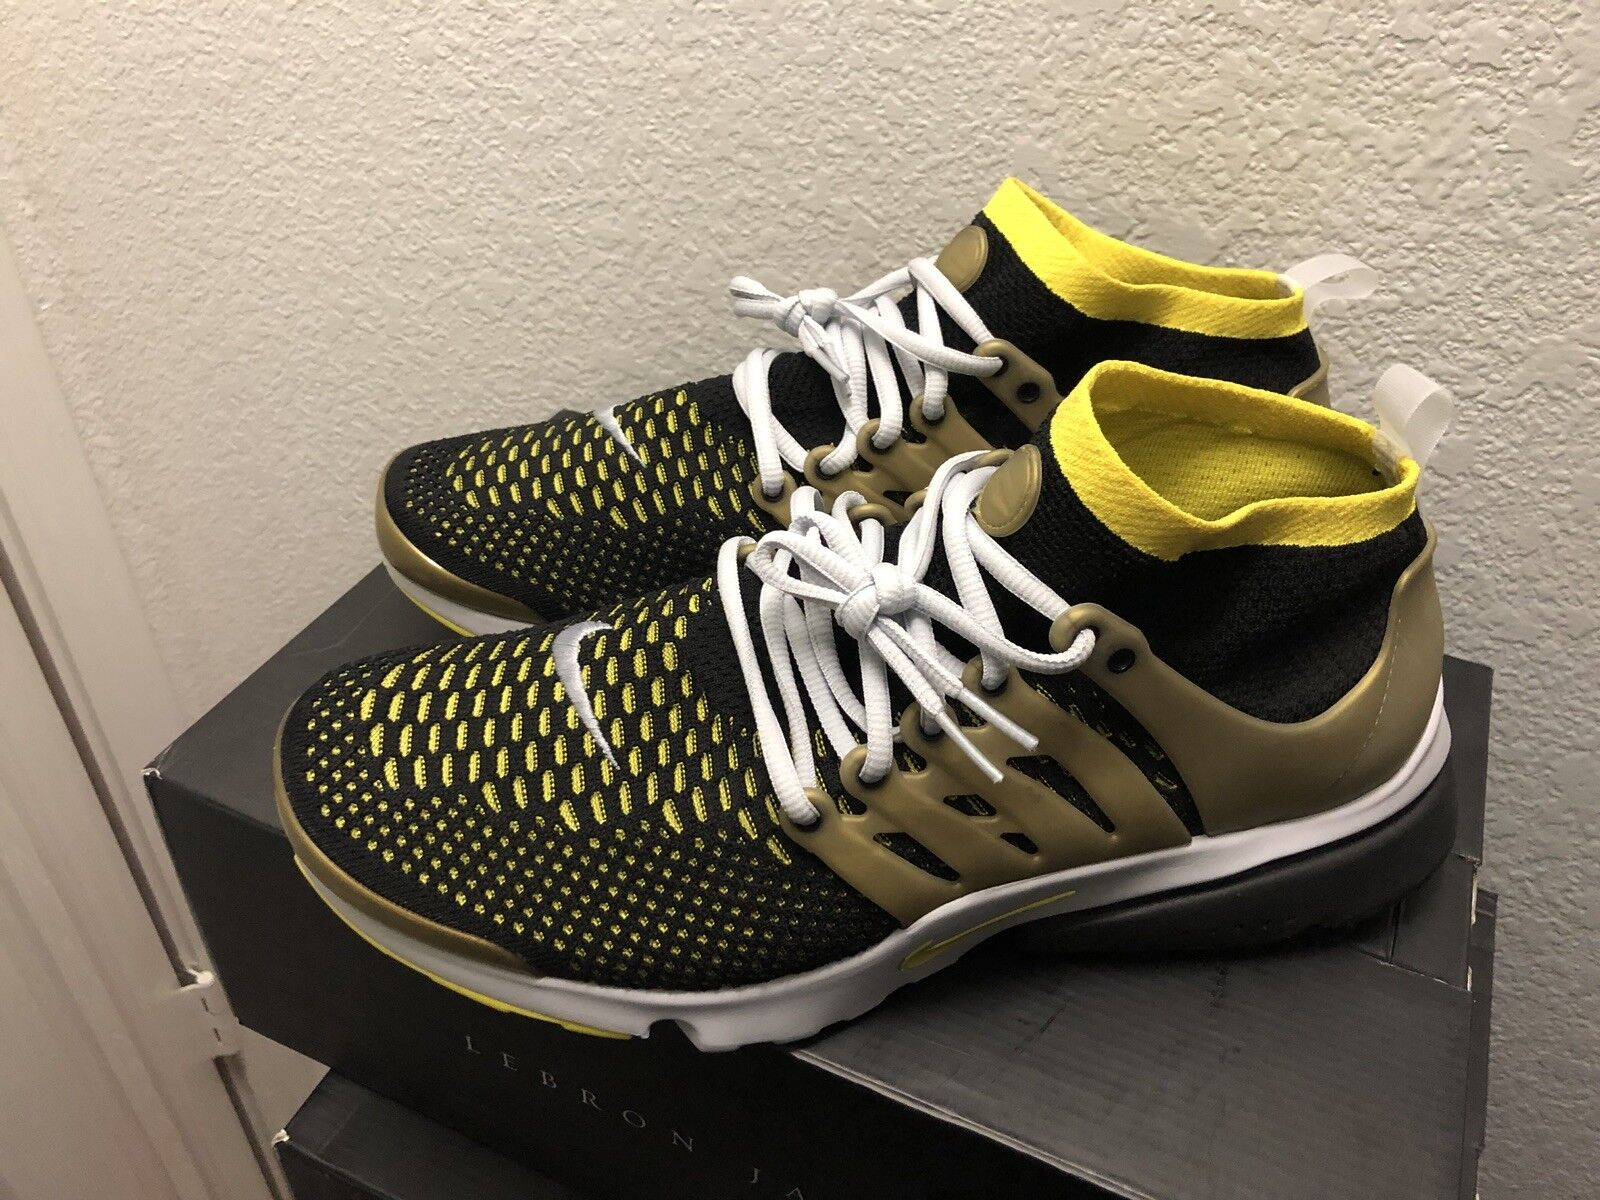 Nike Air Presto Flyknit Ultra Black Yellow Gold 835570-007 Comfortable Brand discount